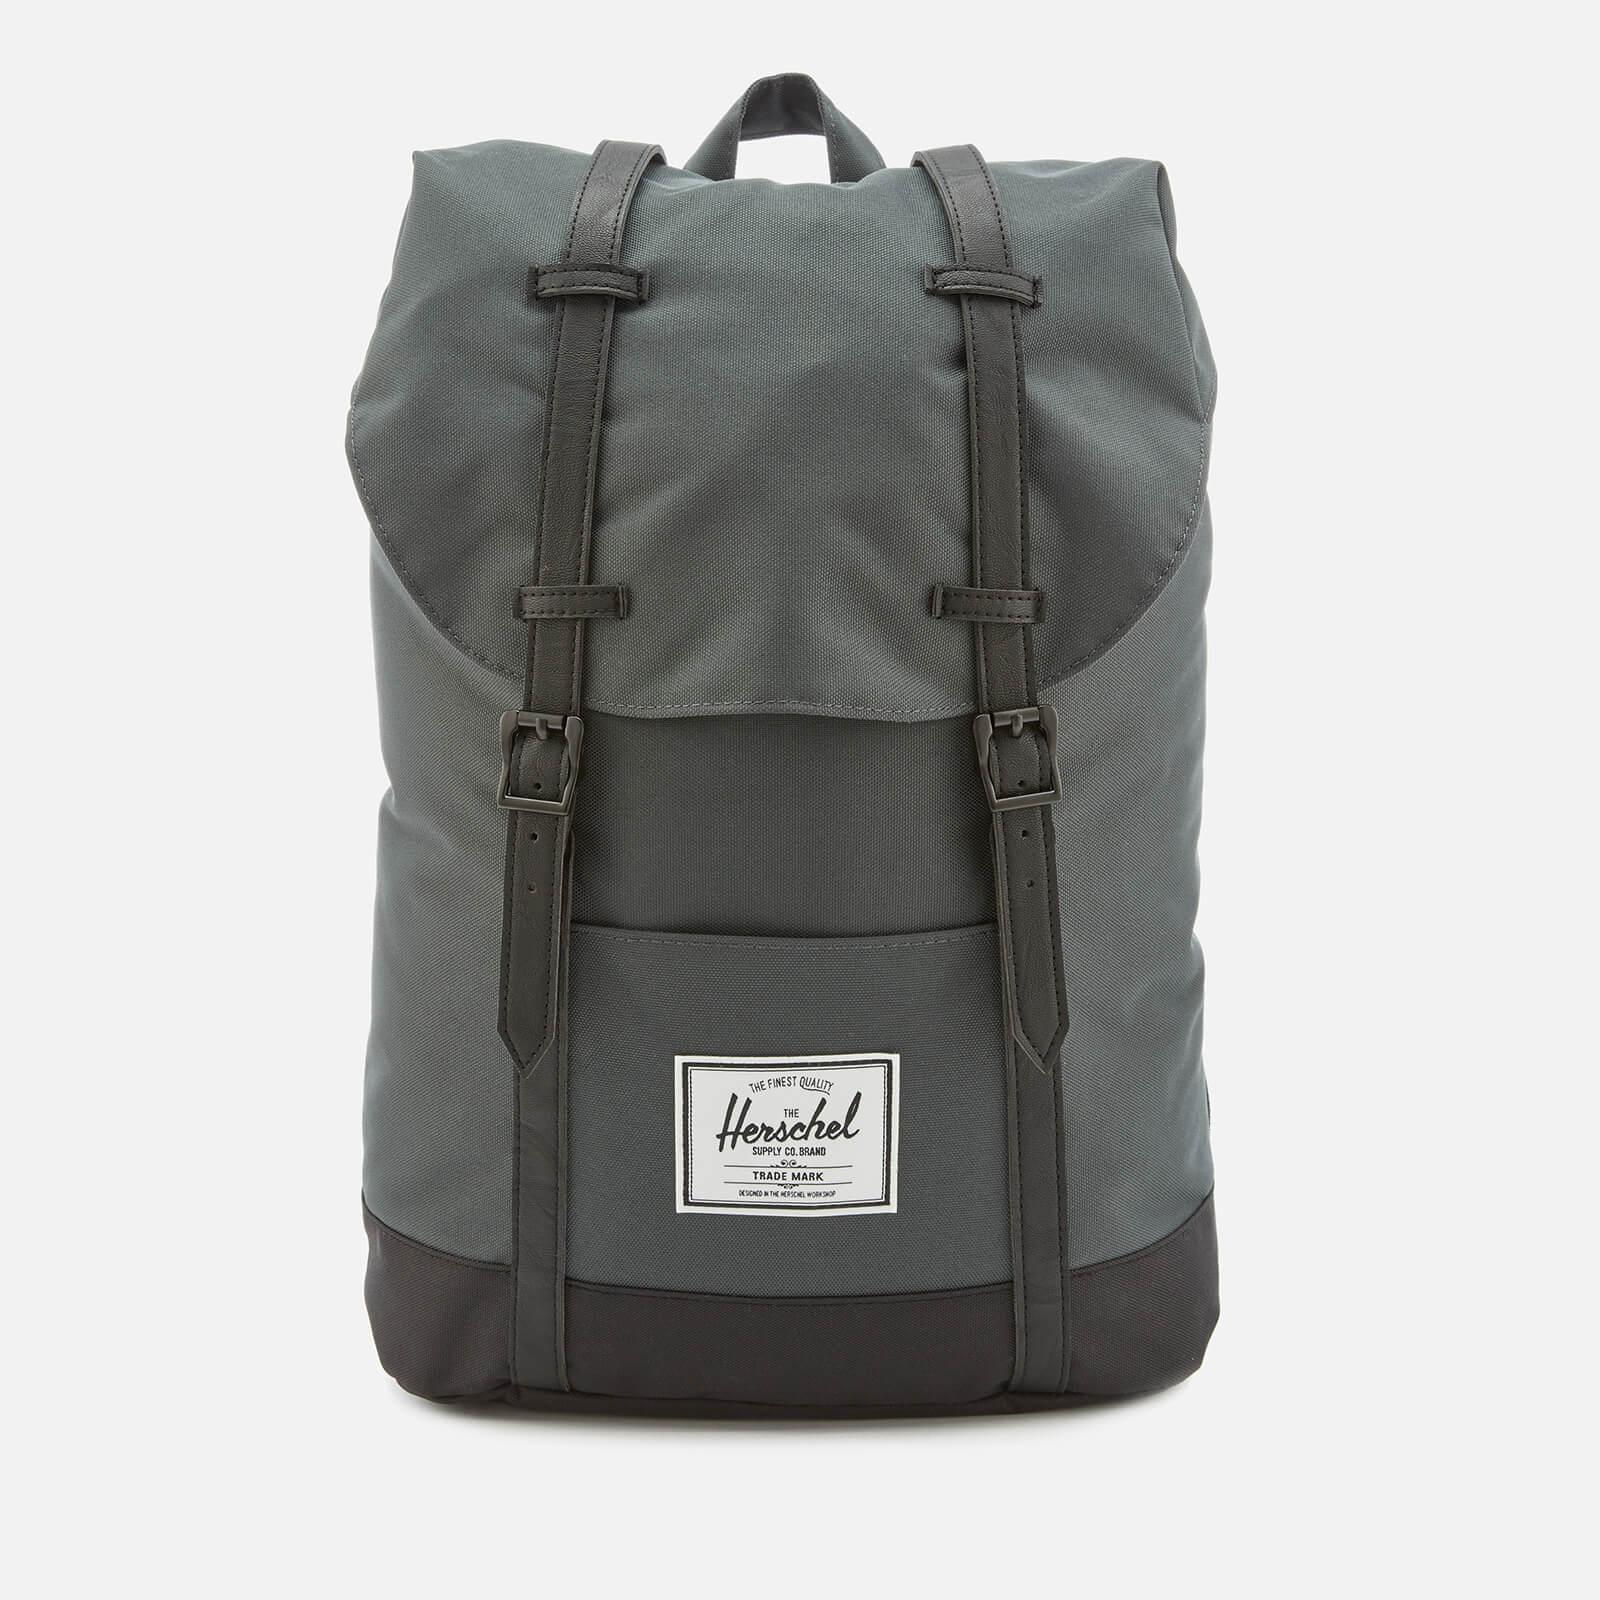 a0391543dd Herschel Supply Co. Men s Retreat Backpack - Dark Shadow Black ...